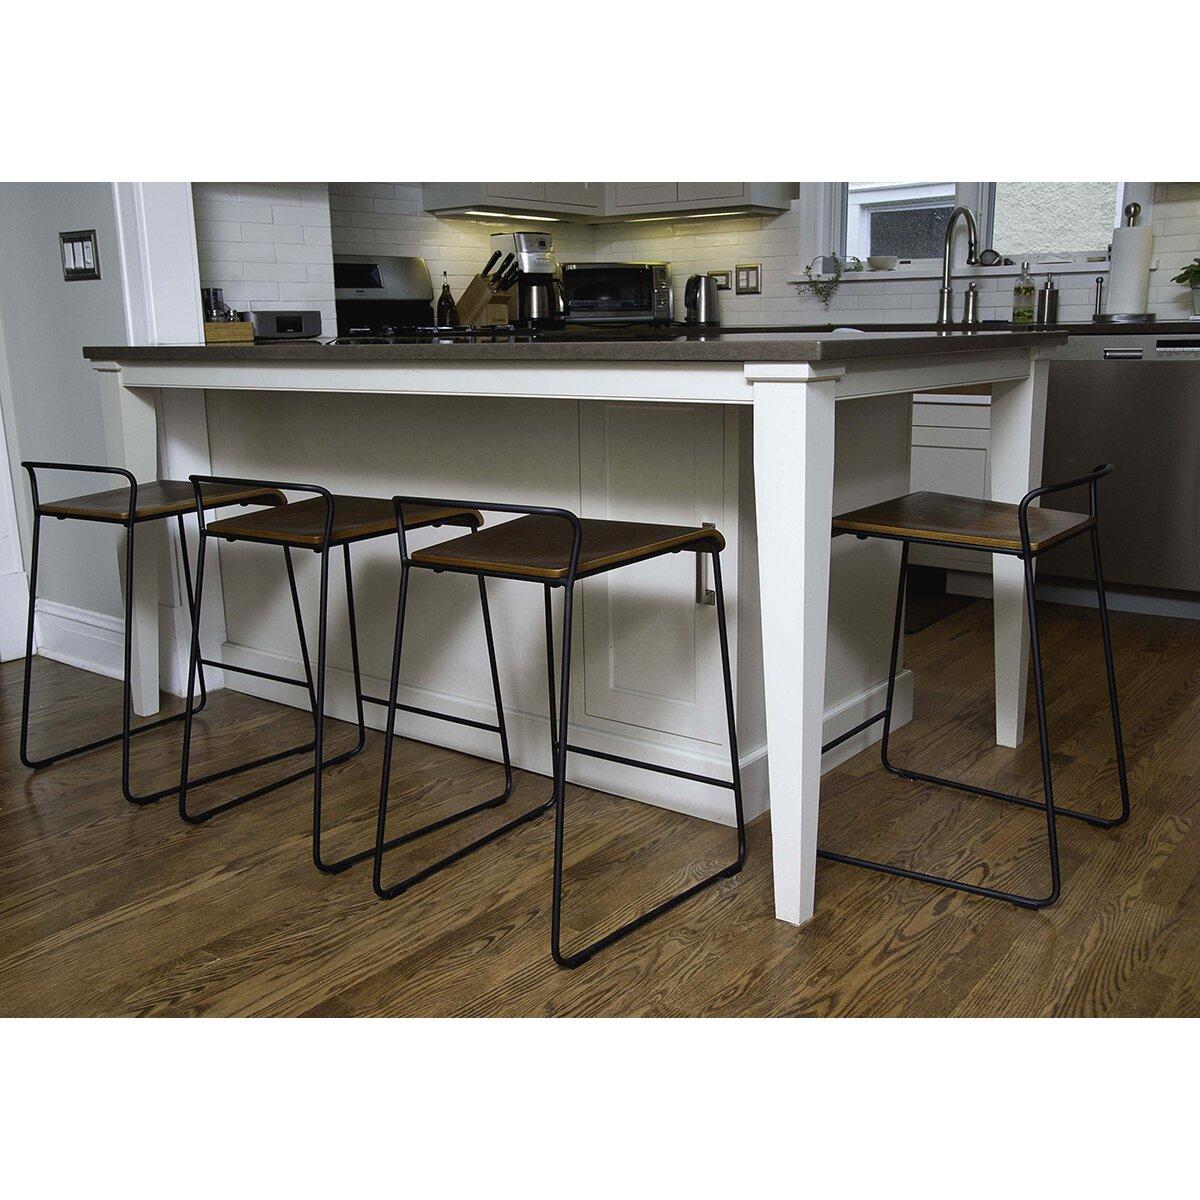 M a d furniture transit 24 bar stool reviews wayfair for Furniture 24